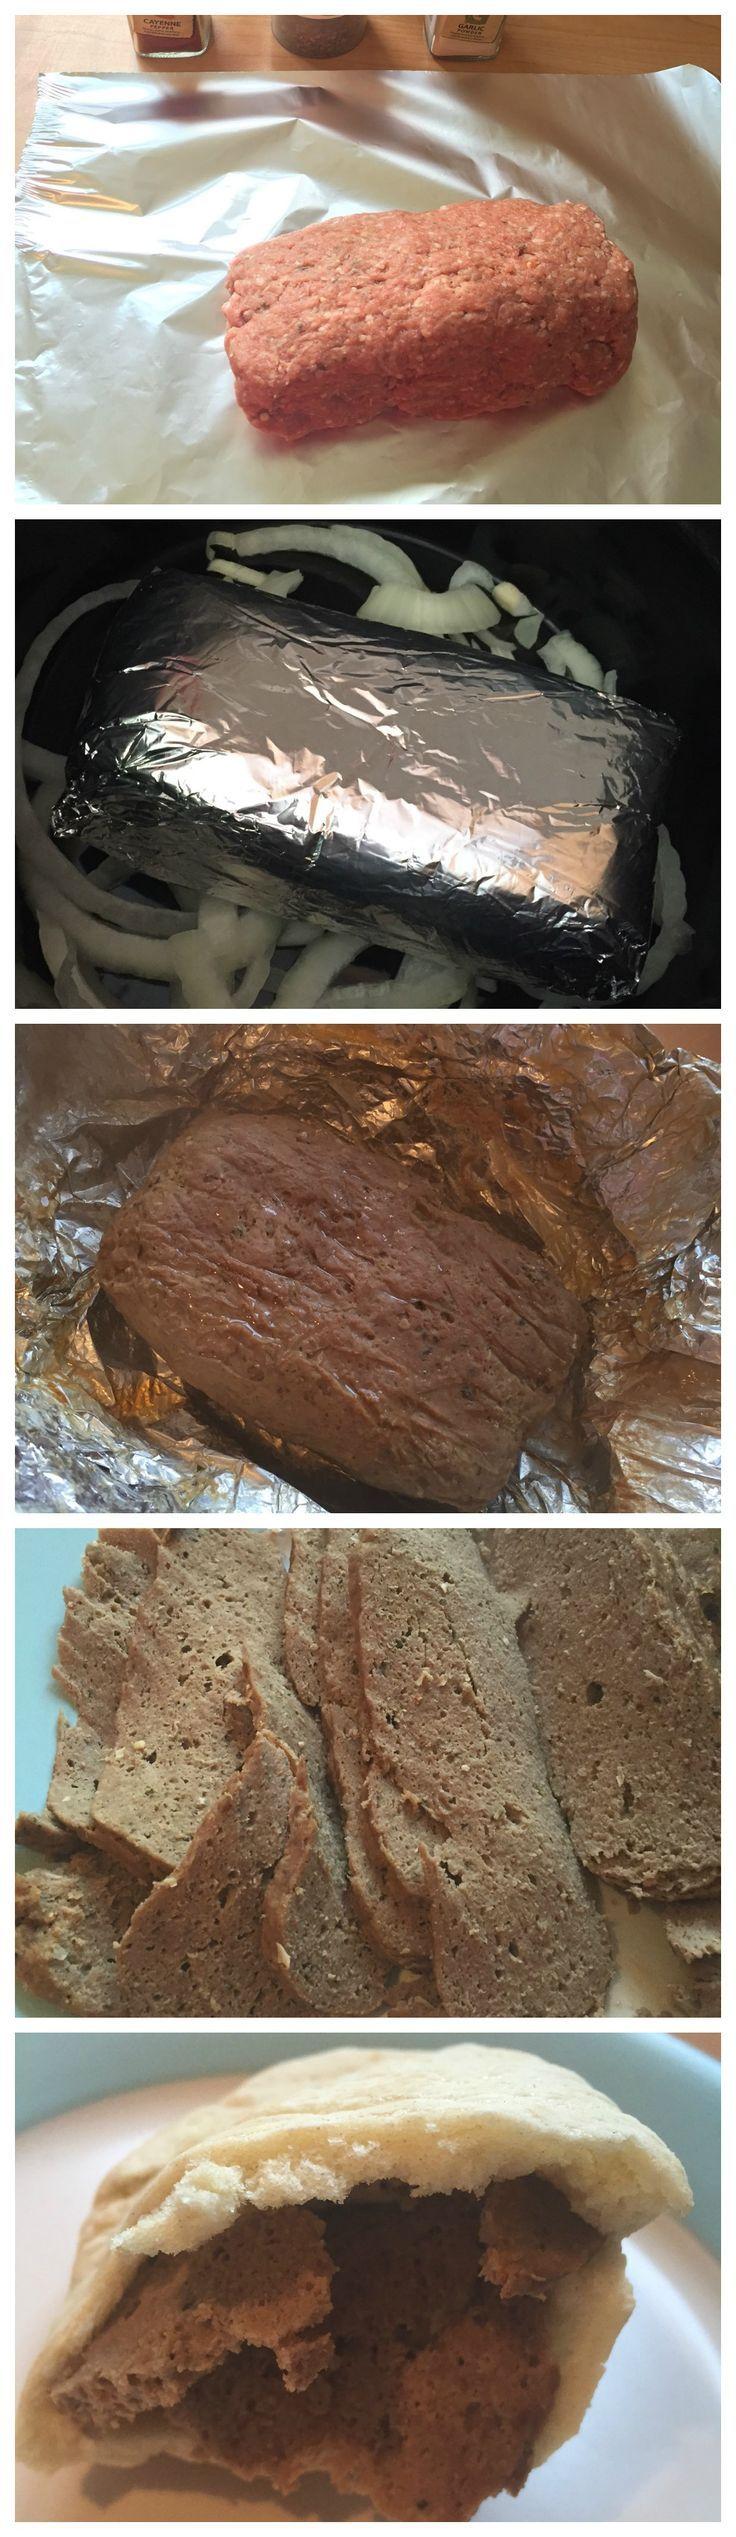 Homemade doner kebab #SlimmingWorld #Fakeaway #SlowCooker #Crockpot